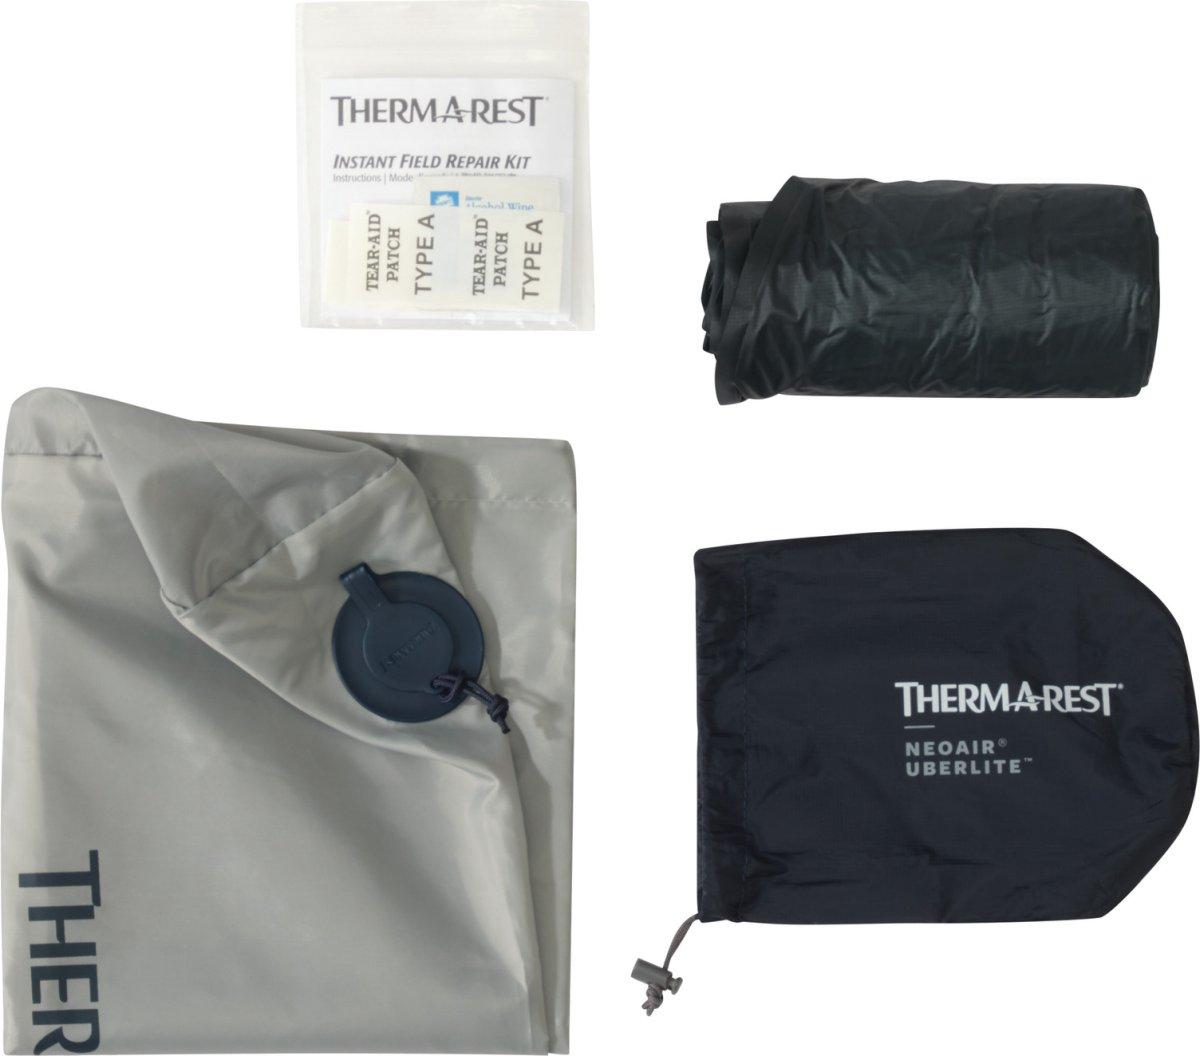 Therm-a-Rest - NeoAir UberLite, Regular, Isomatte